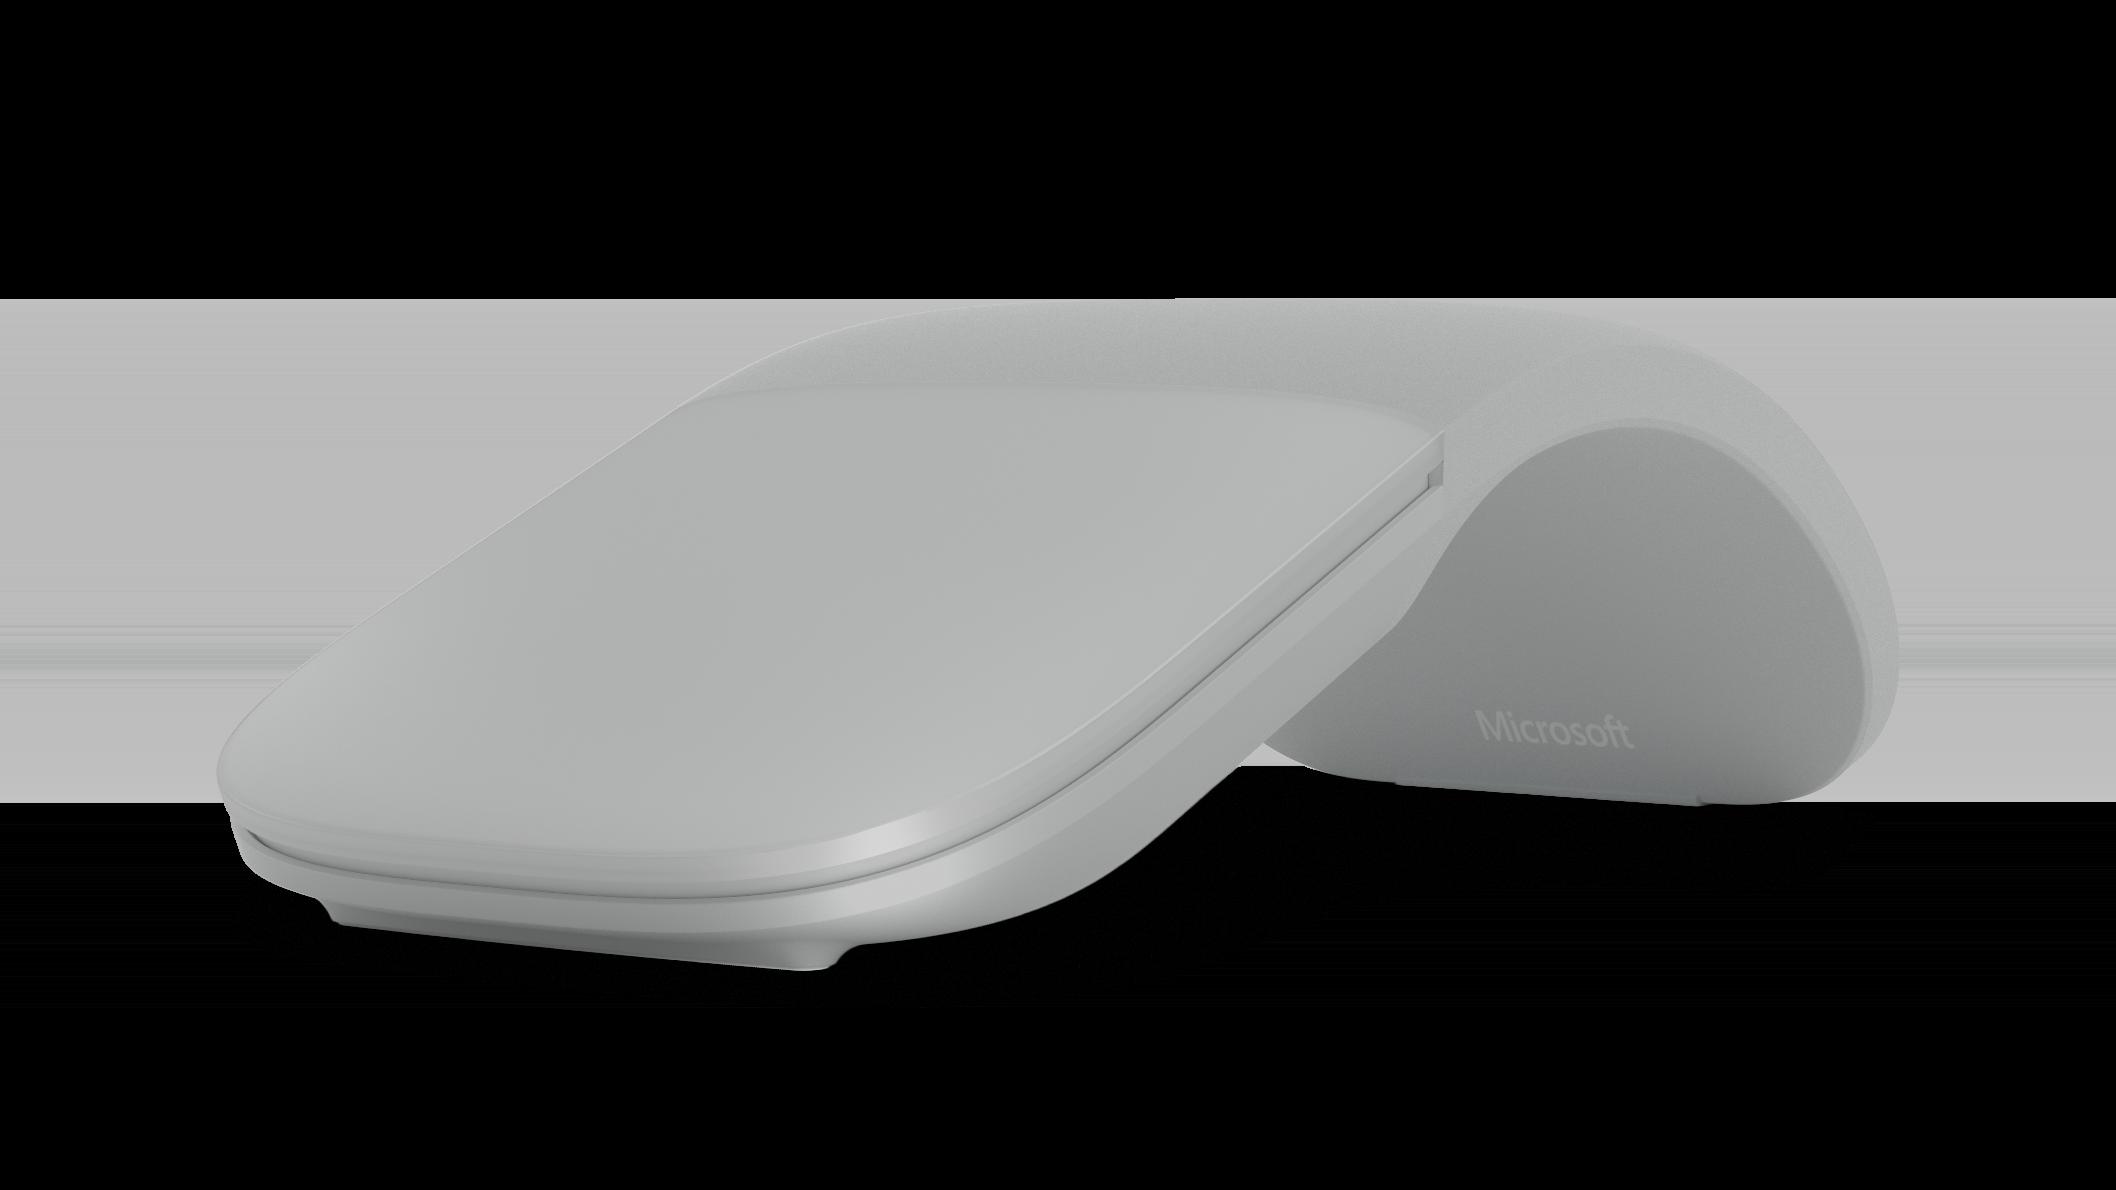 Surface Arcマウス